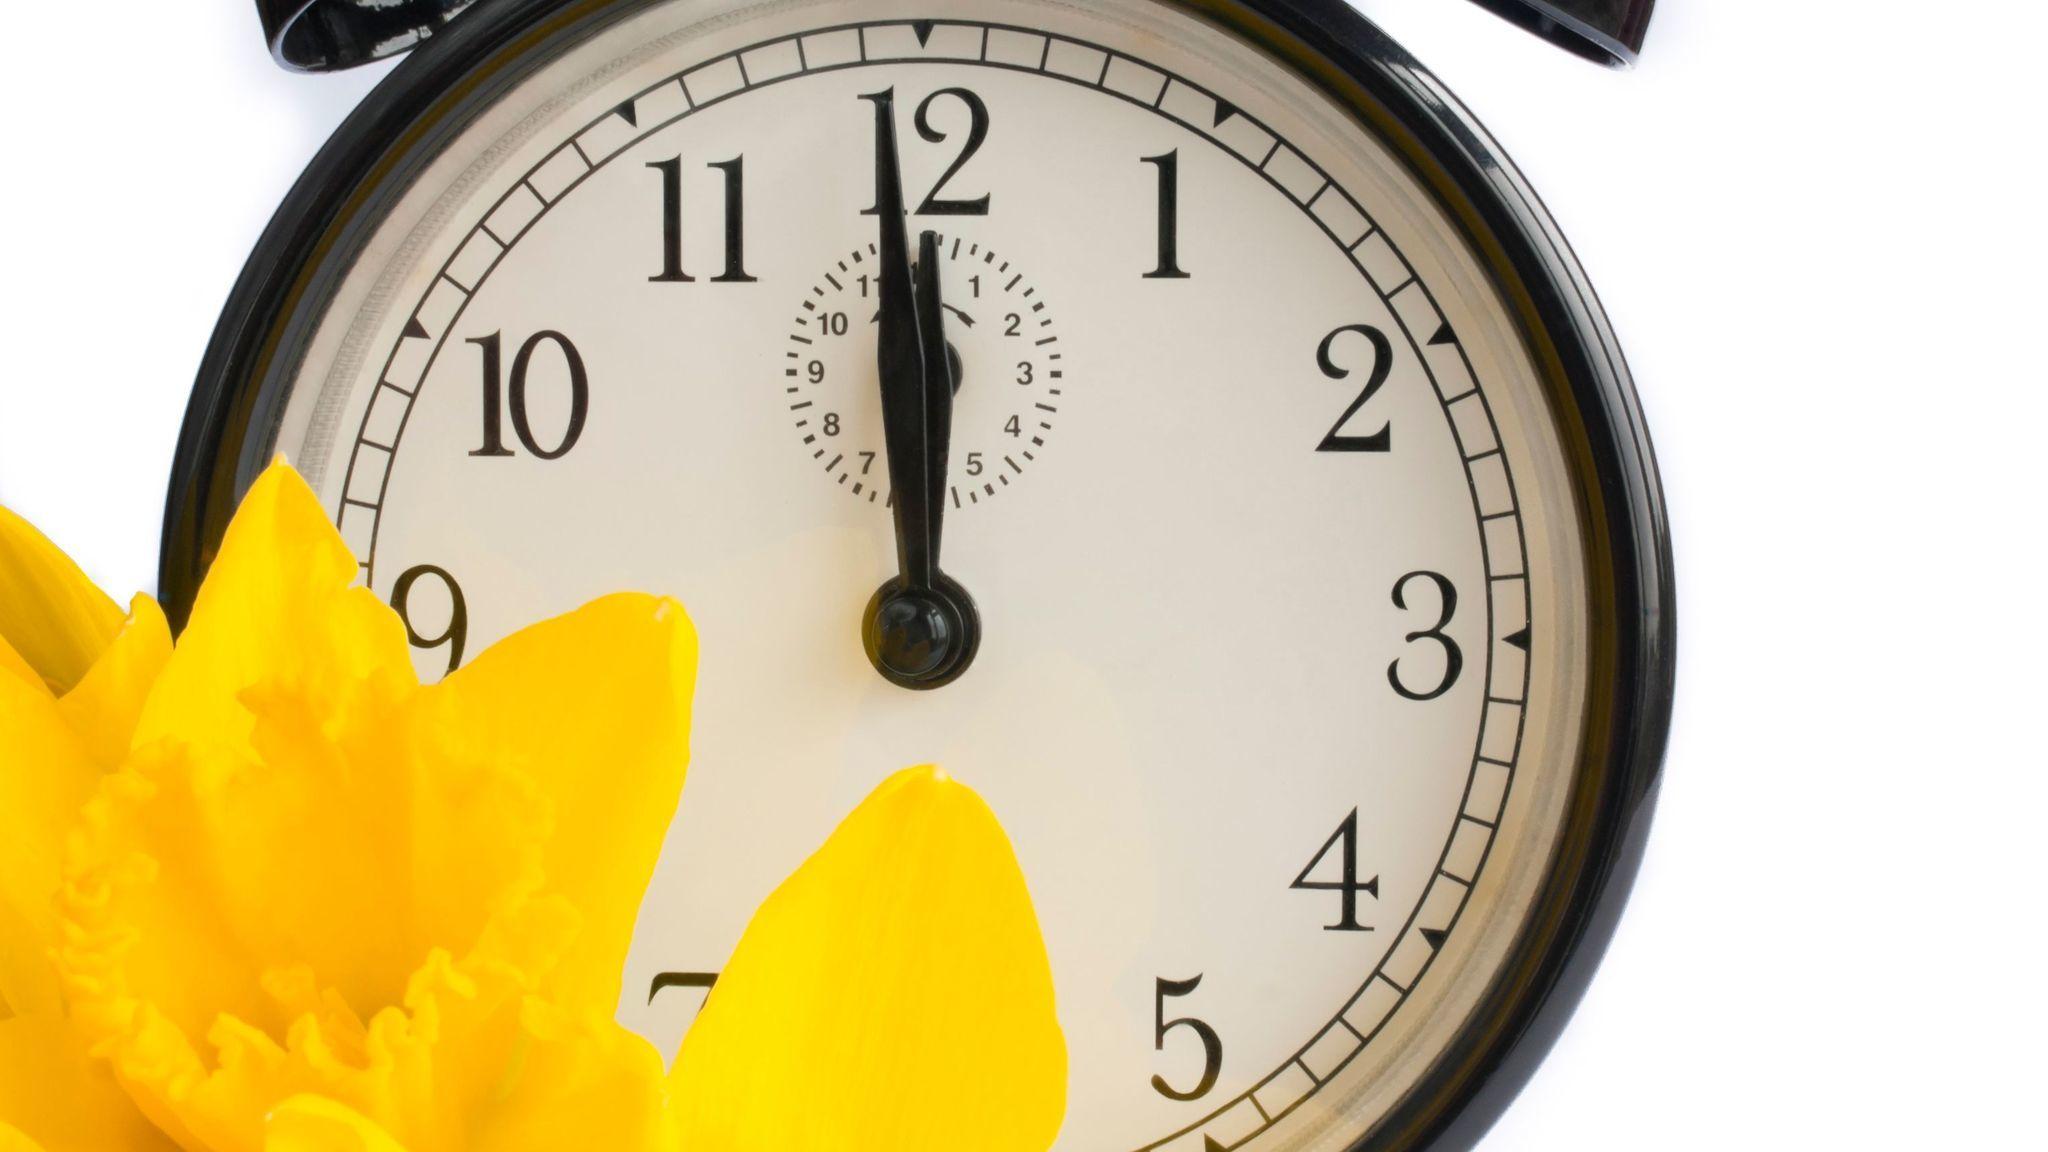 Prepare to spring forward through good sleep hygiene